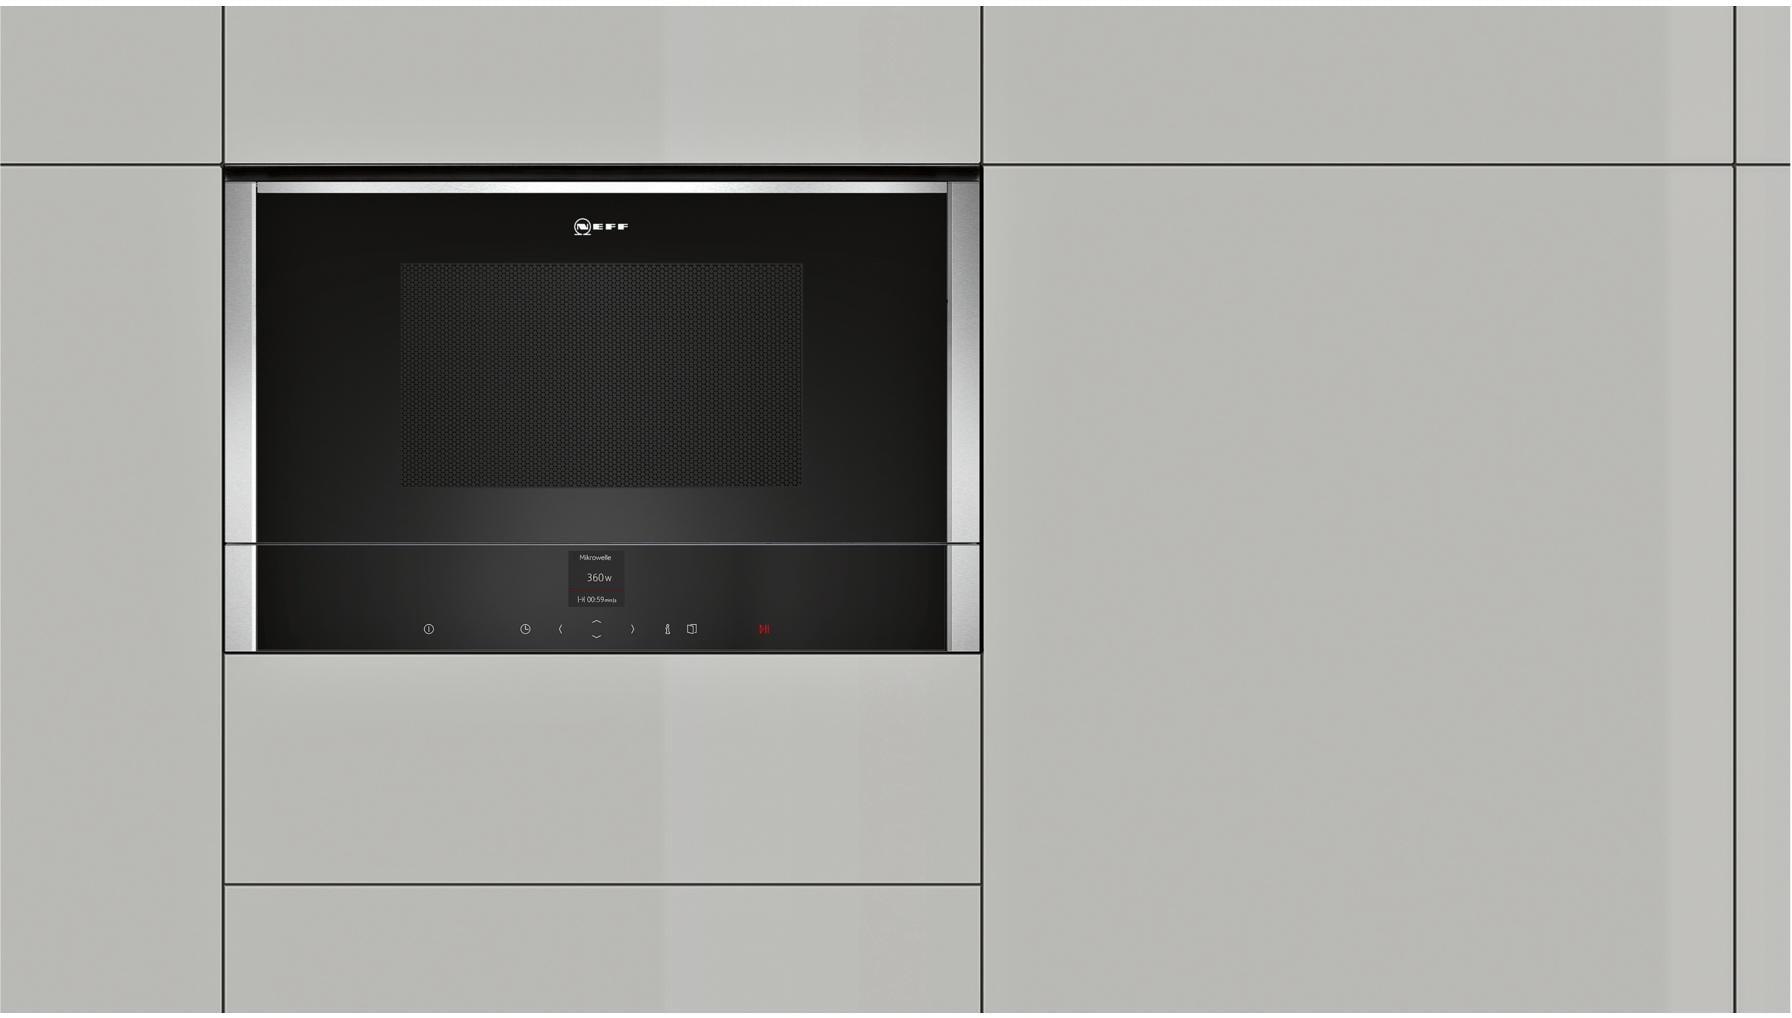 neff cgr 1701 n einbau mikrowelle c17gr01n0 von neff bei elektroshop wagner. Black Bedroom Furniture Sets. Home Design Ideas